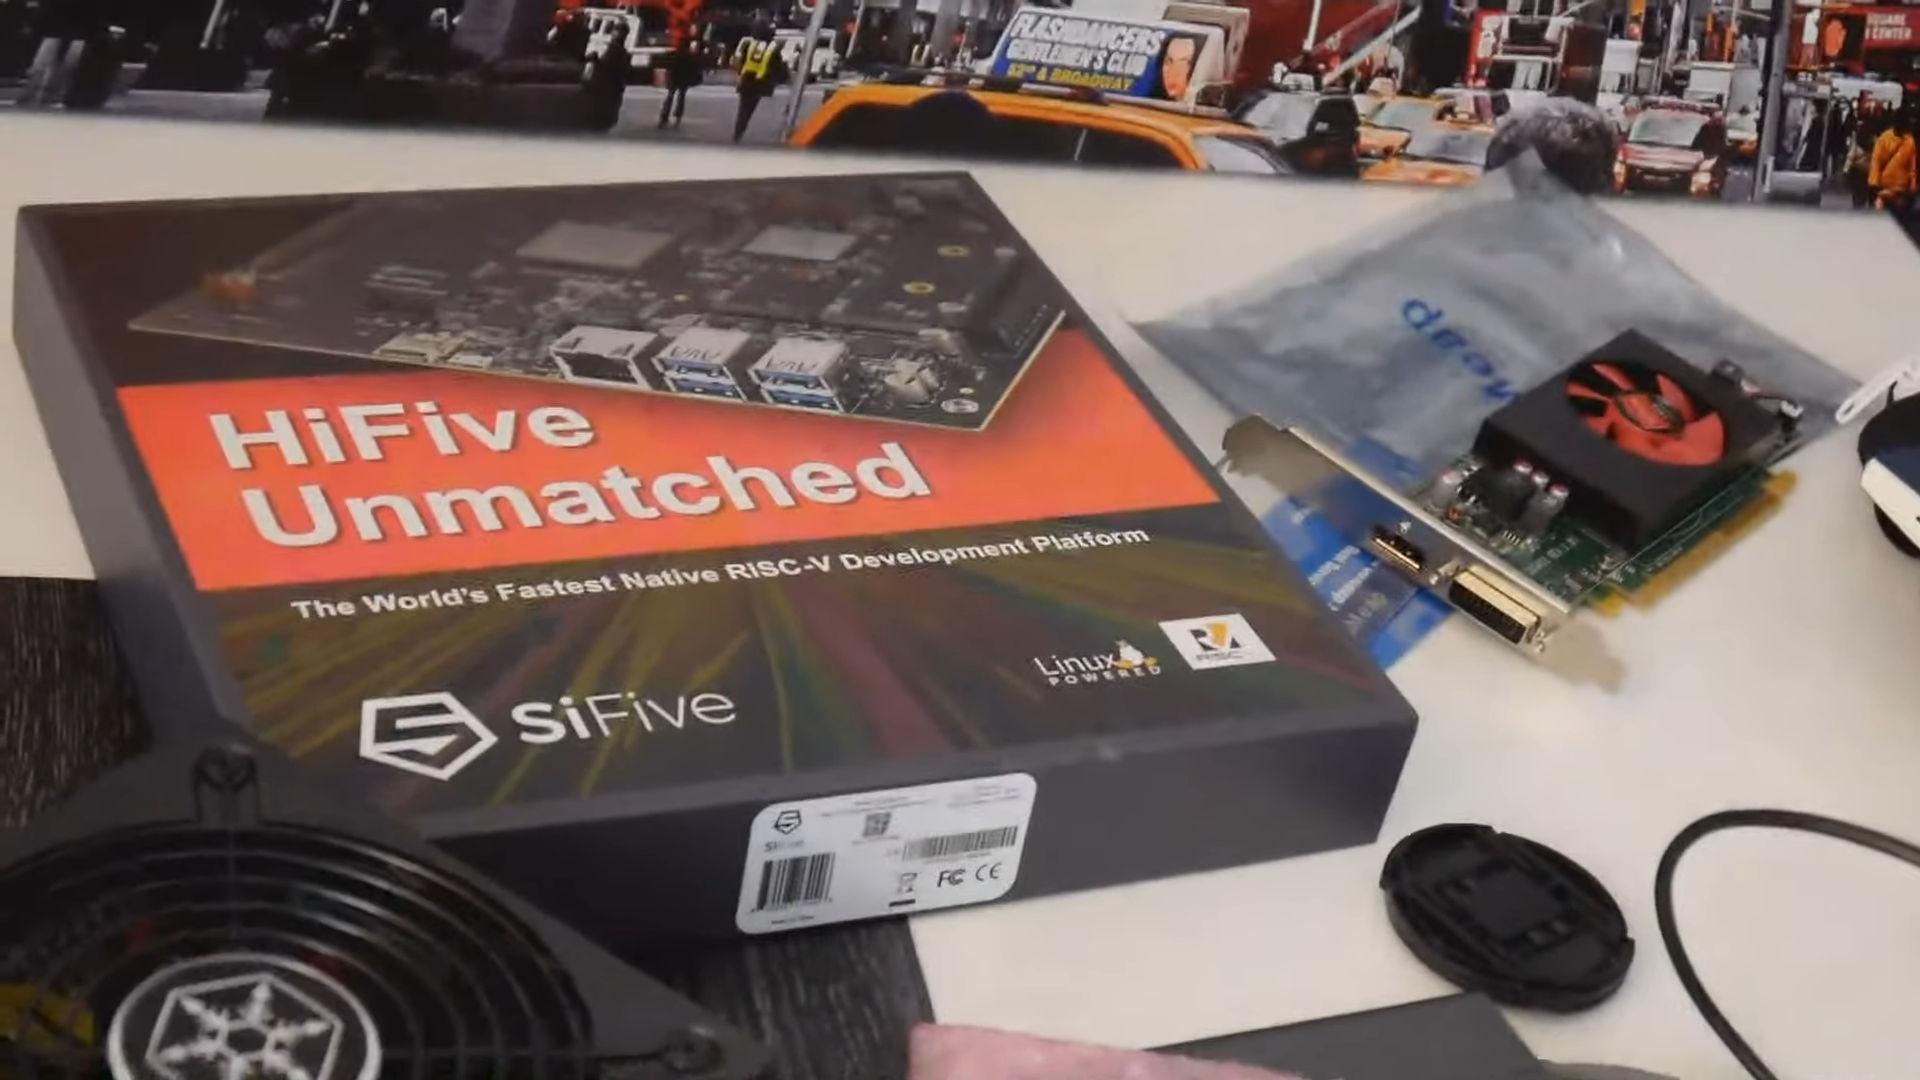 AMD Radeon RX 6700 XT заработала на платформе HiFive Unmatched с архитектурой RISC-V